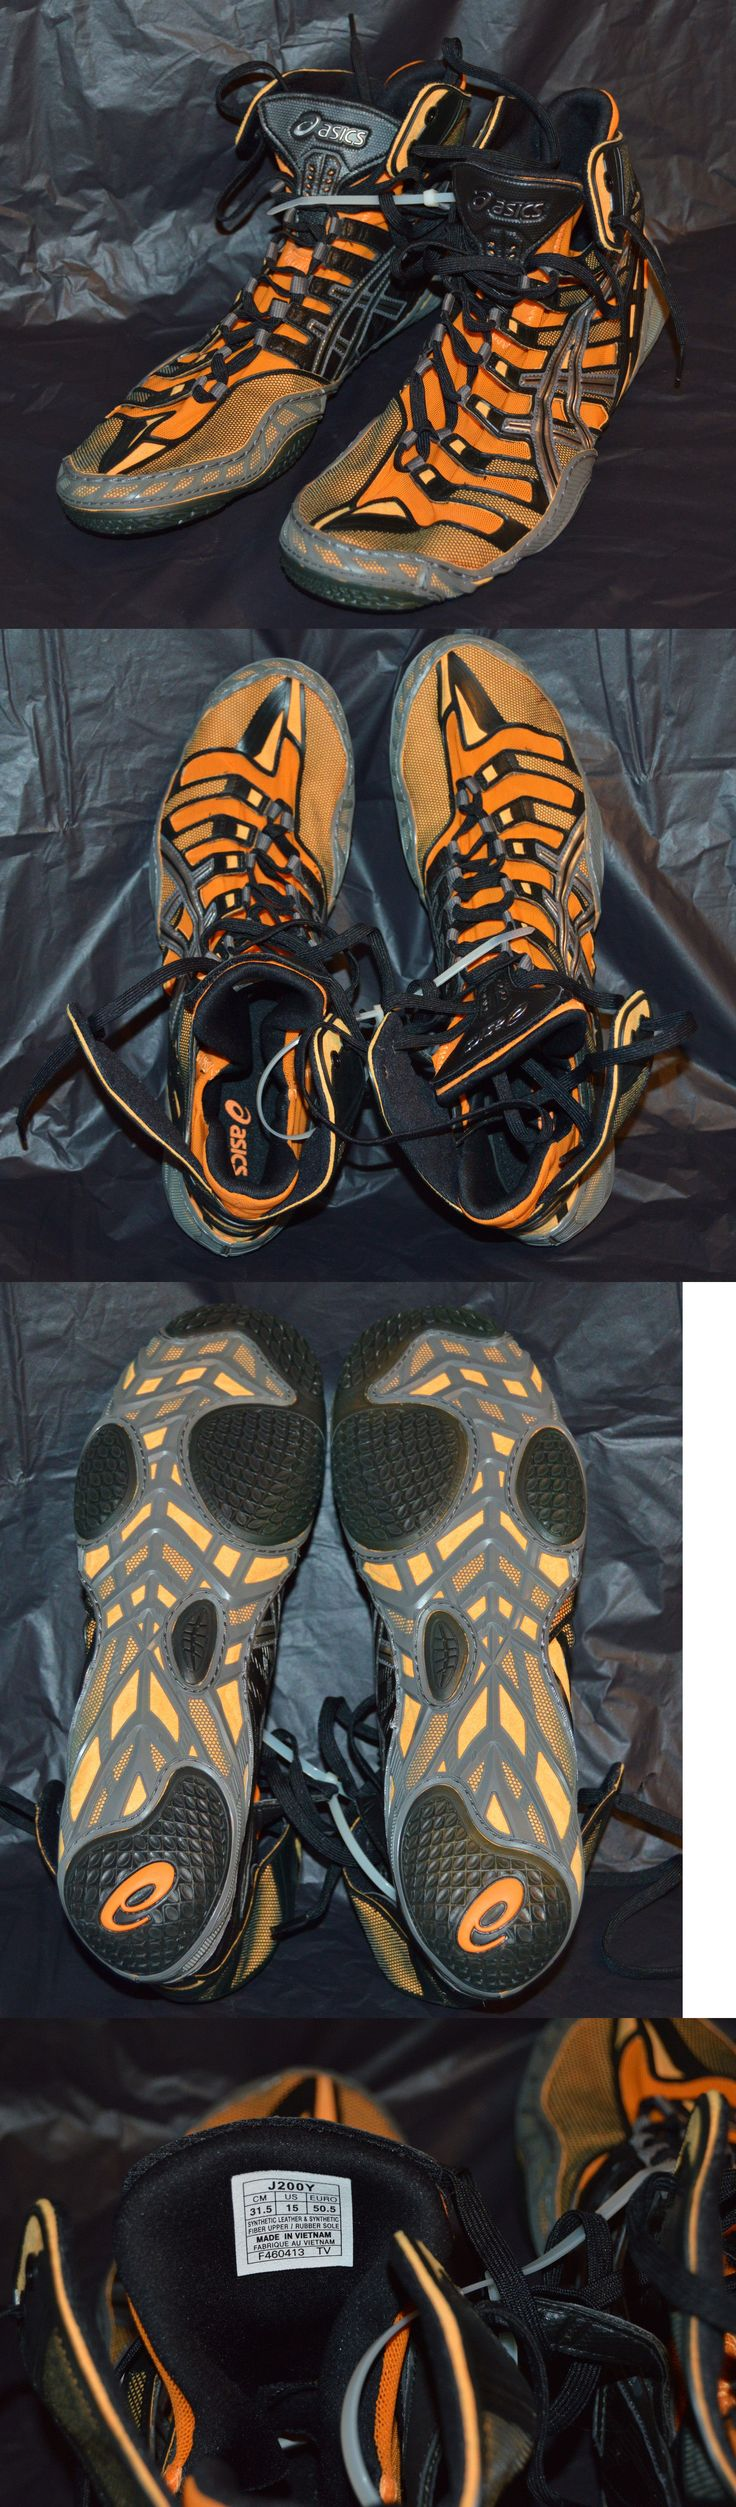 Footwear 79799: Asics Omniflex Pursuit Wrestling Shoes Orange/Silver/Black New Mens Size 15 BUY IT NOW ONLY: $135.95